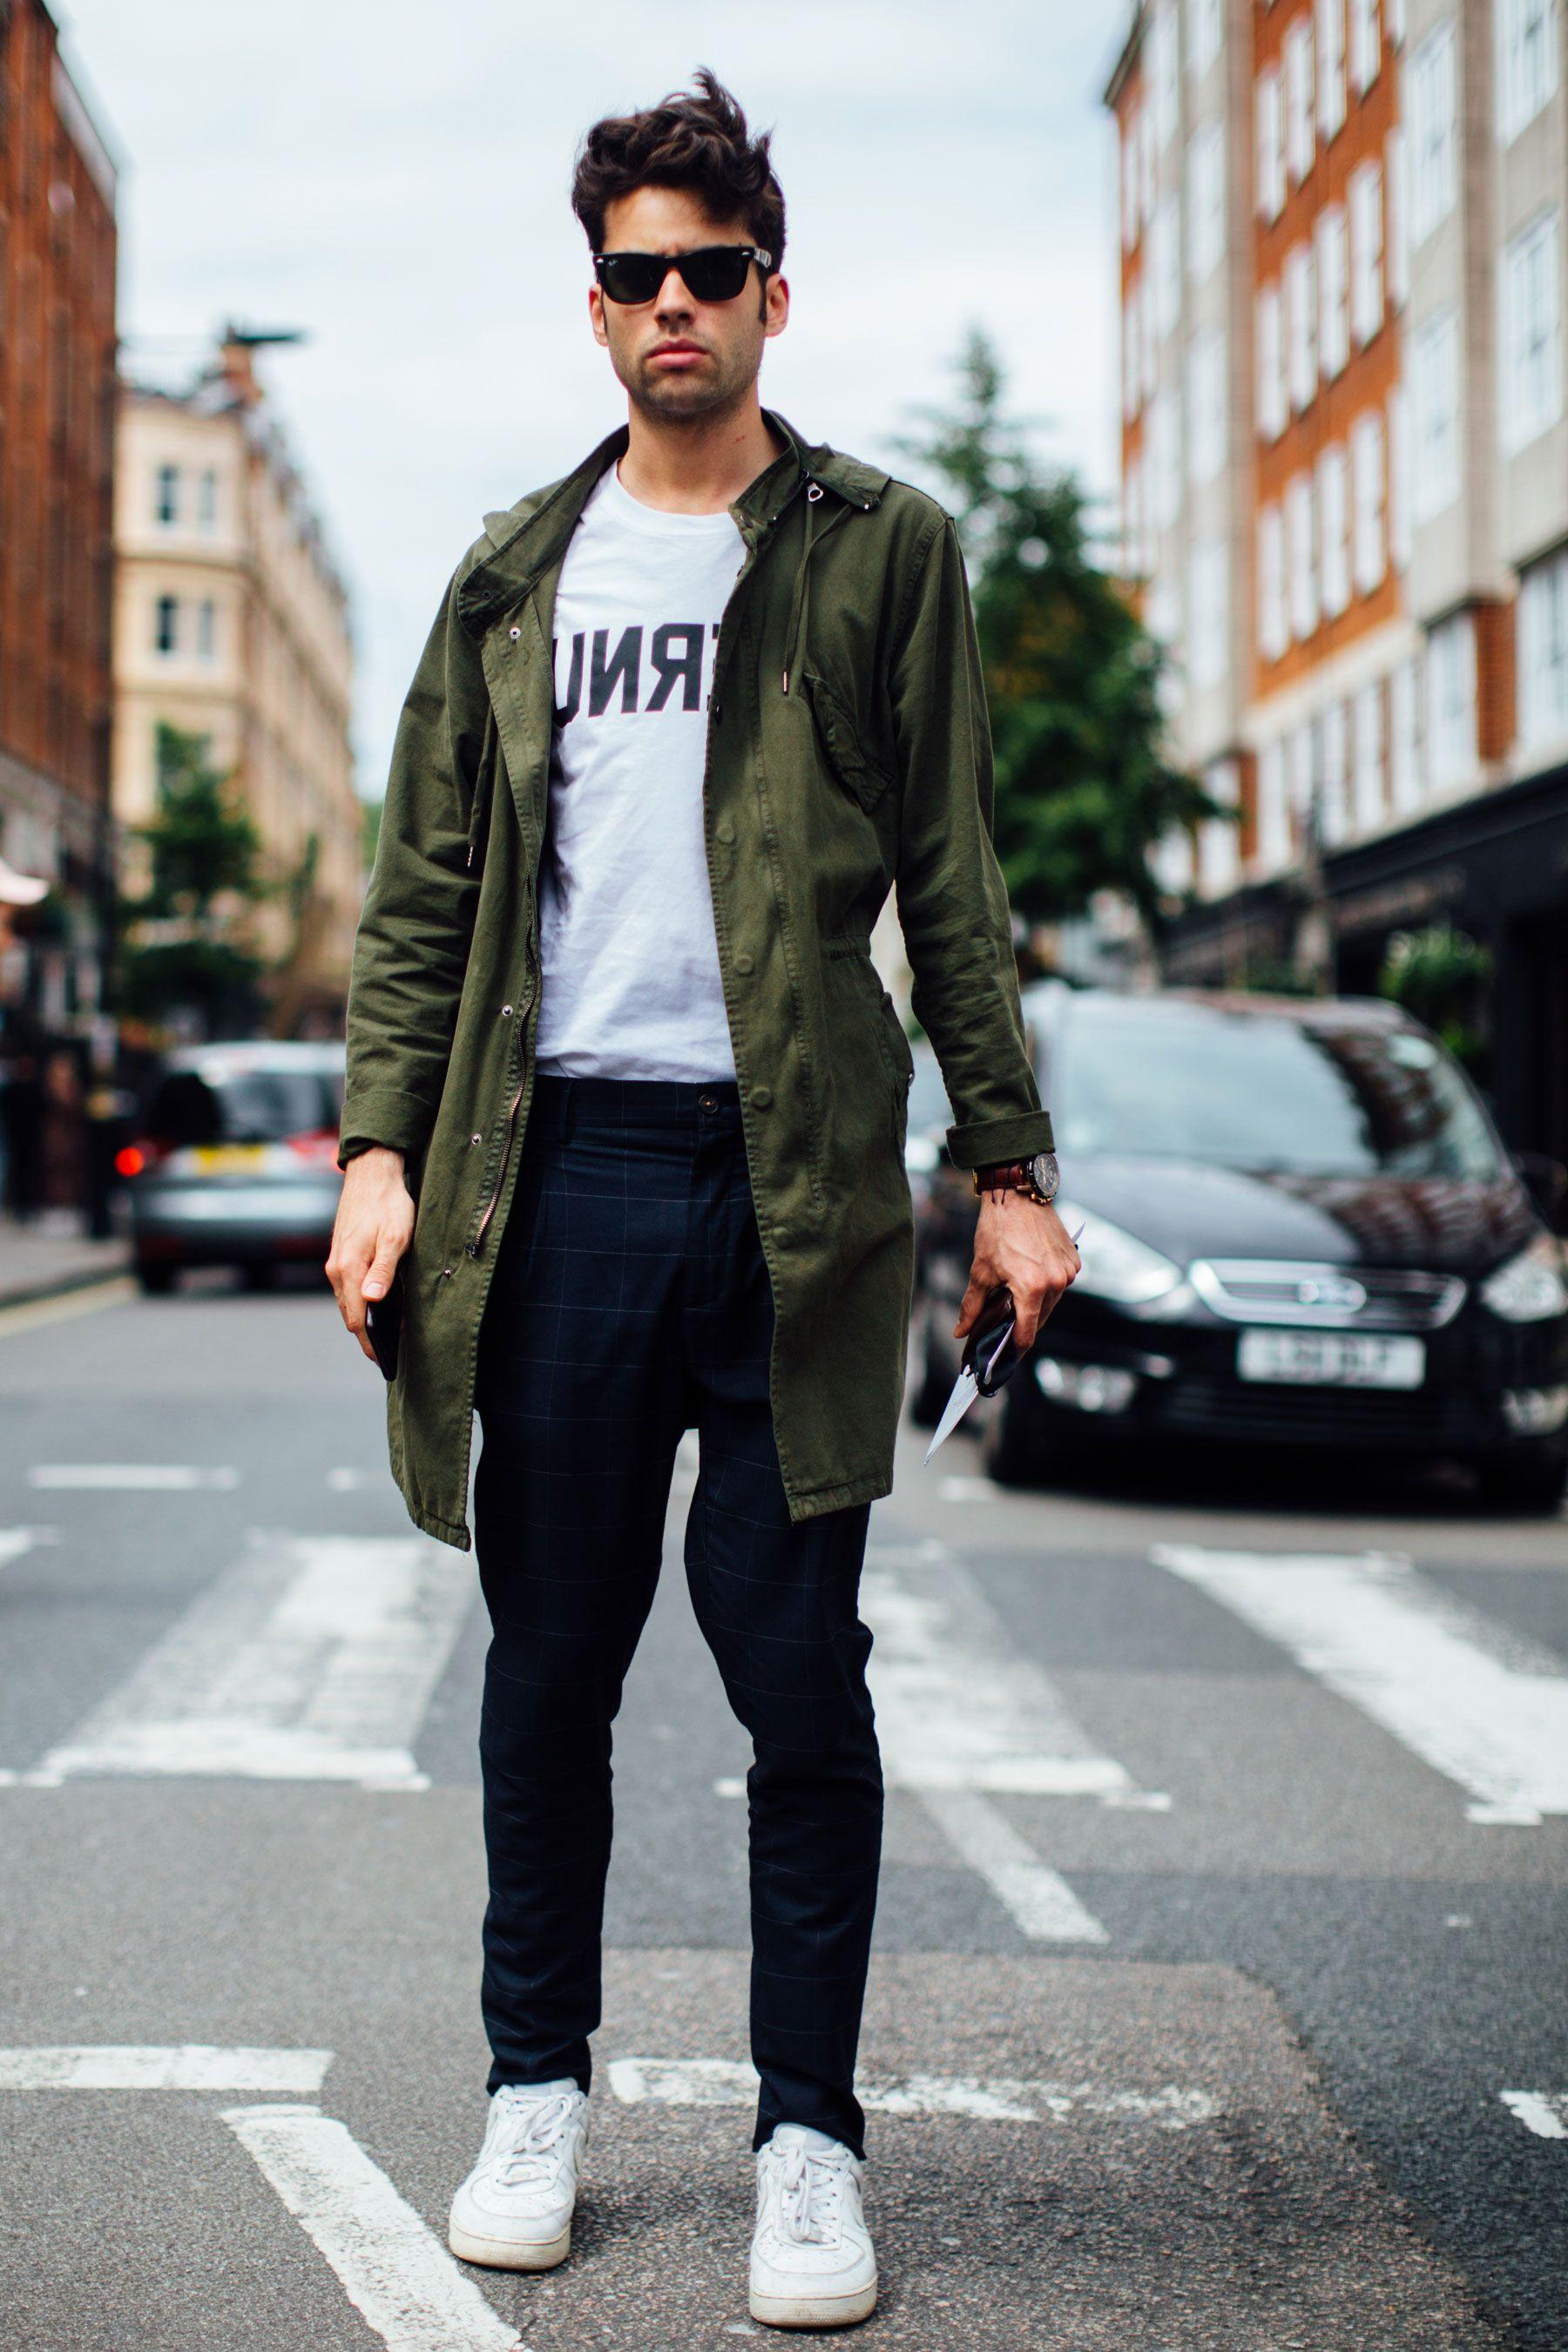 410edd09fa5 London Fashion Week Men's Street Style Spring 2018 Day 4   Men's ...